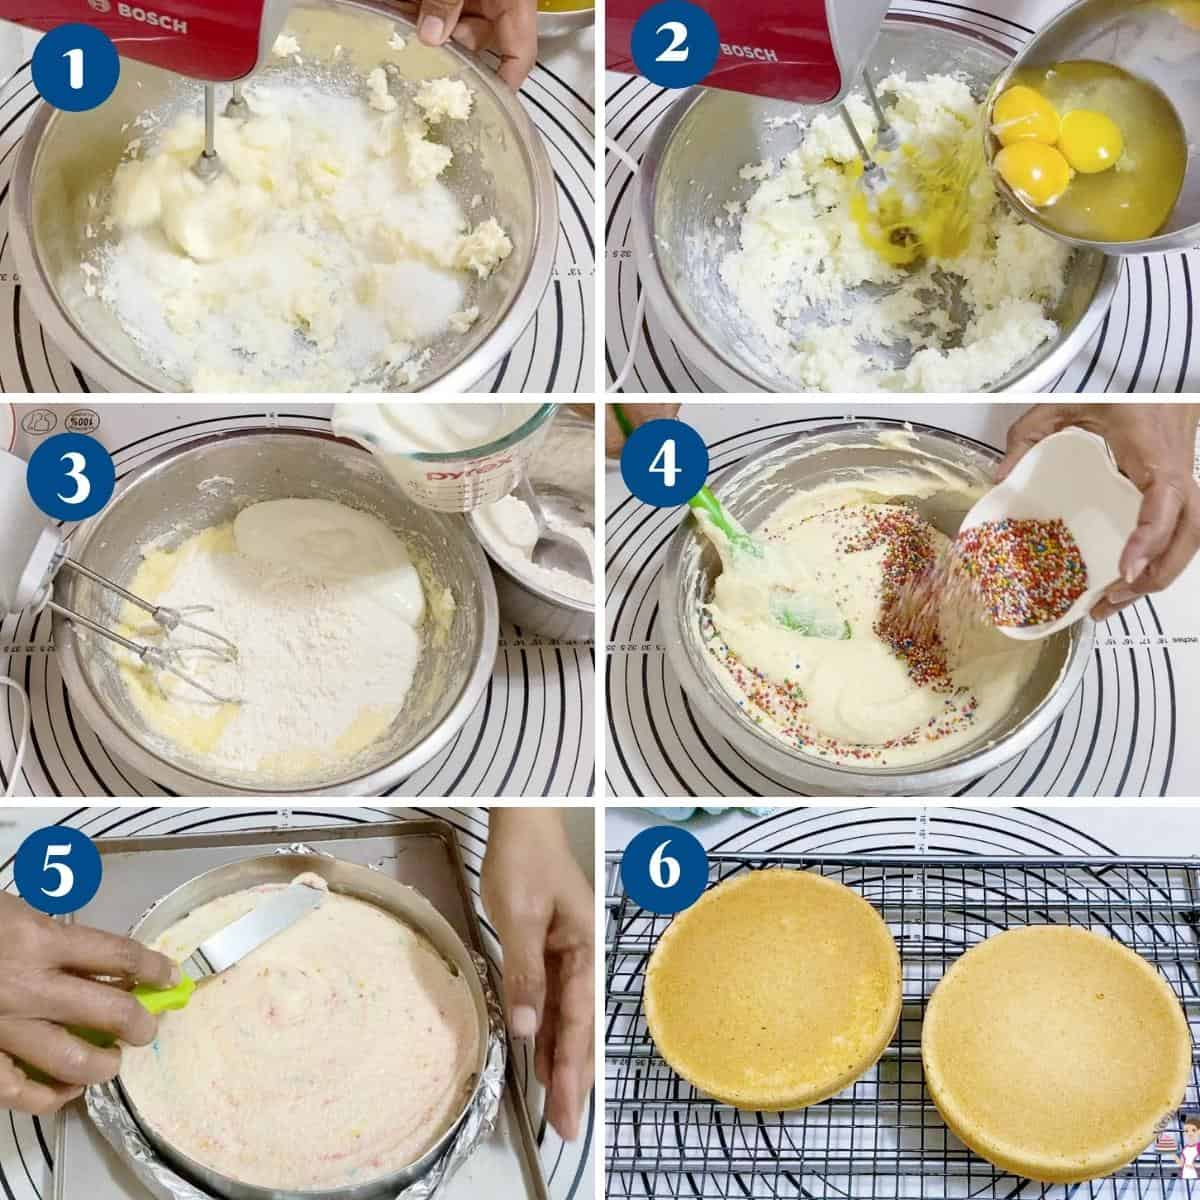 Progress pictures baking the funfetti cake.